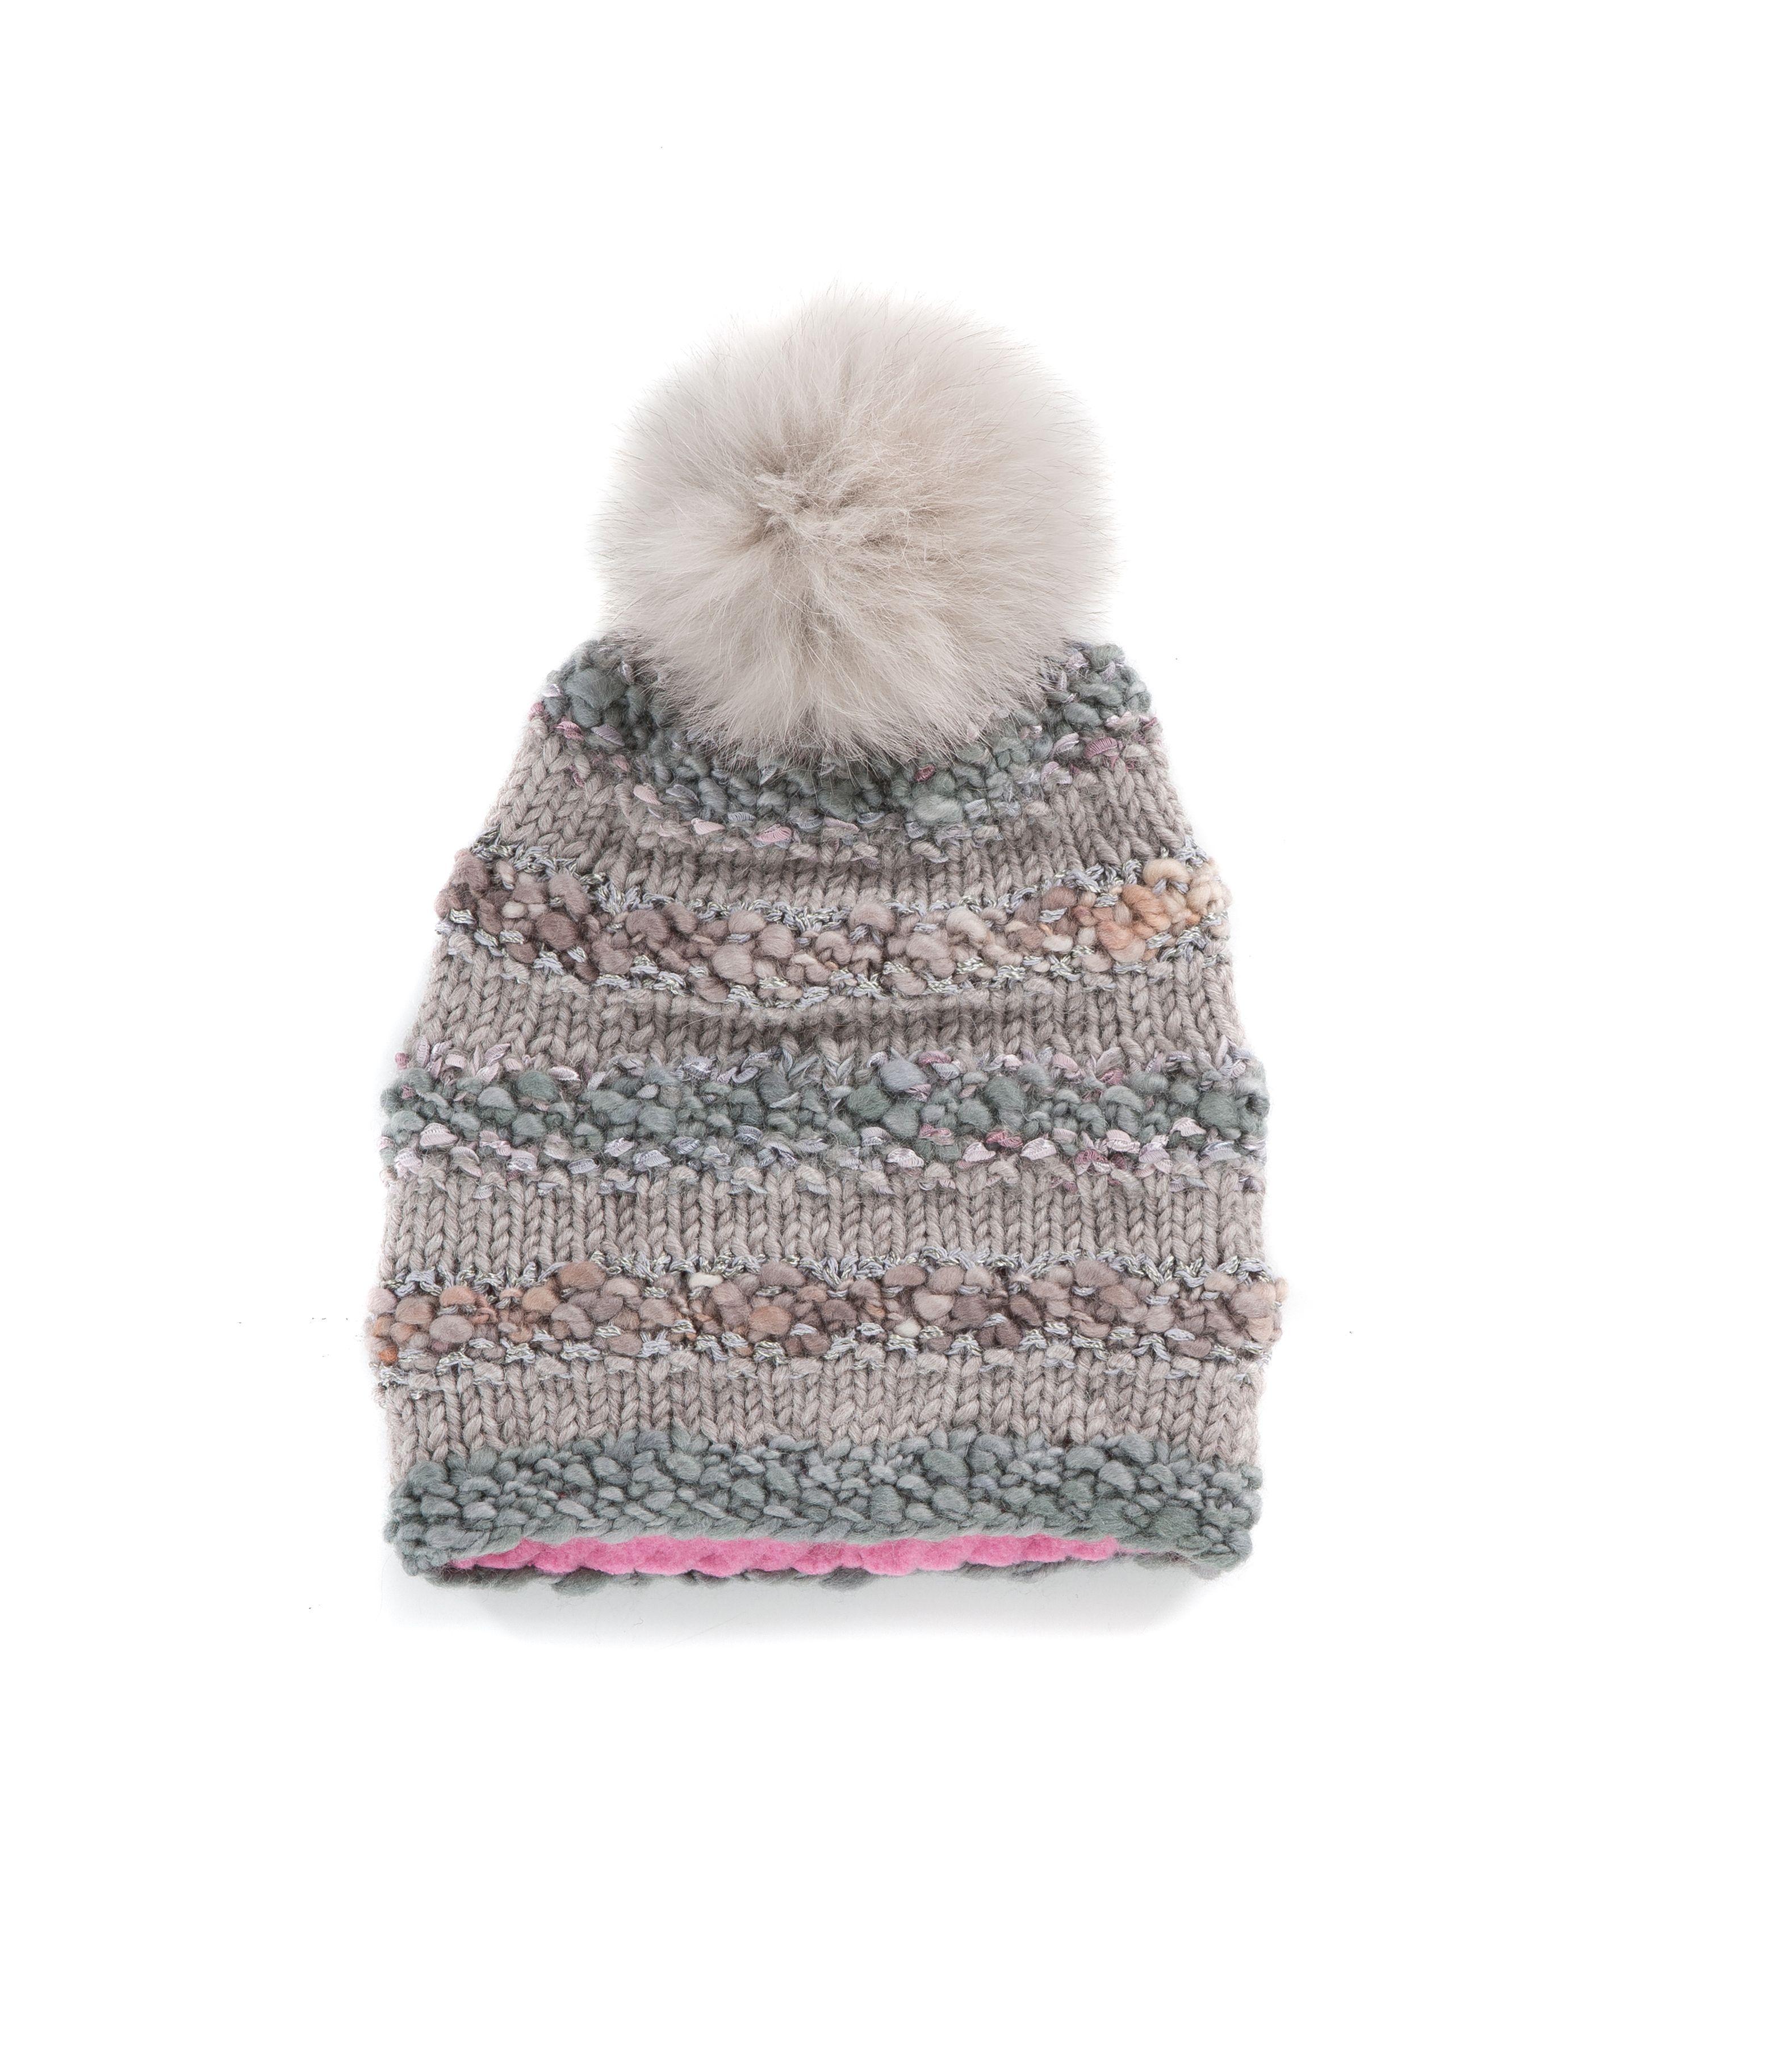 d0fac38b850 KNIT BEANIE CAP FOR WOMEN in Grey River Rock - The GŌBLE Women Knit Beanie  Cap